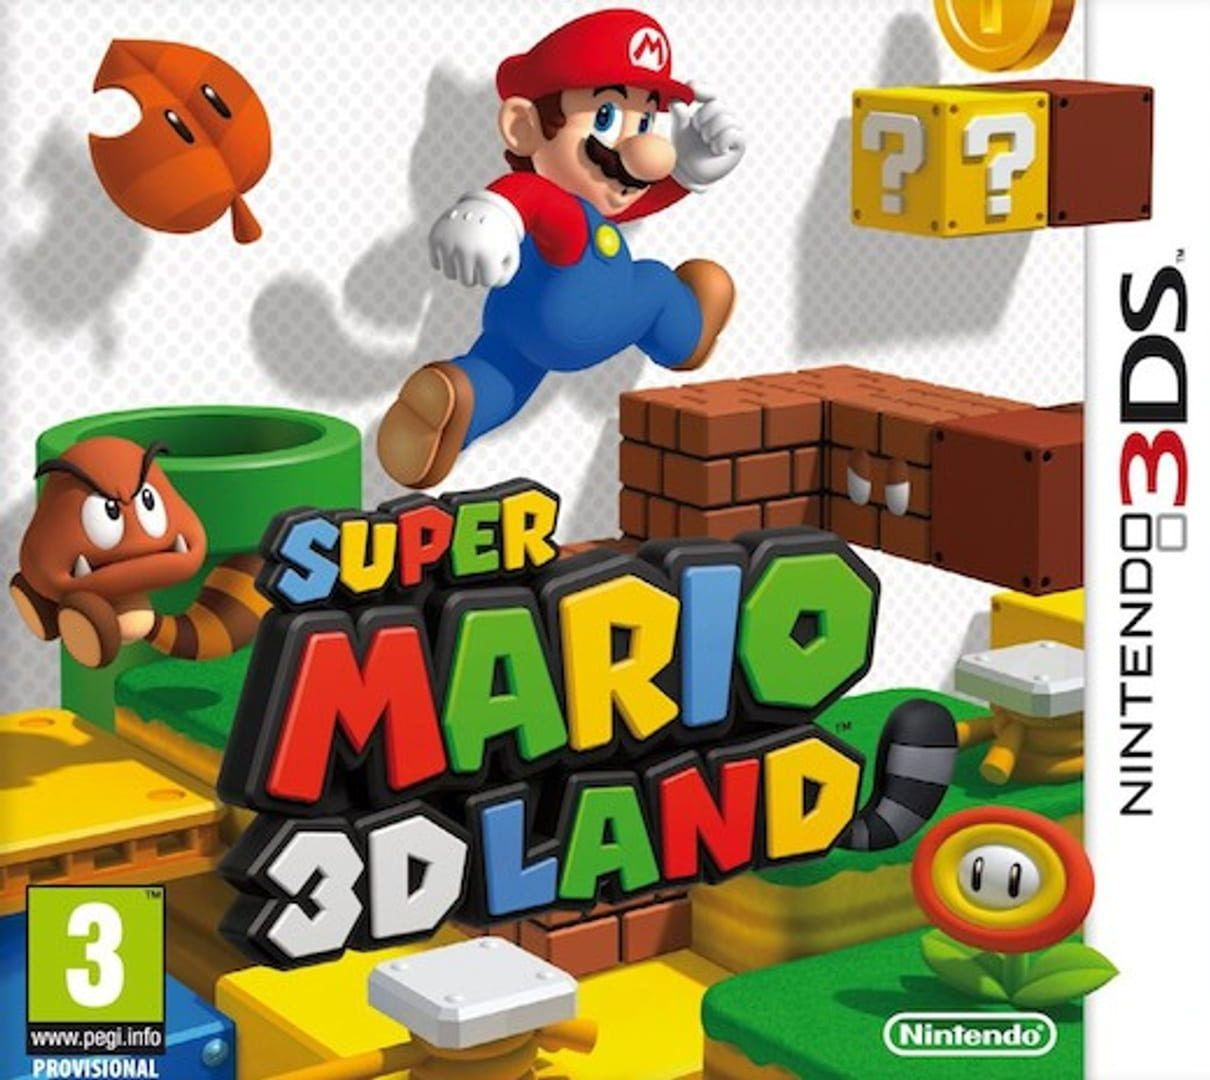 buy Super Mario 3D Land cd key for all platform